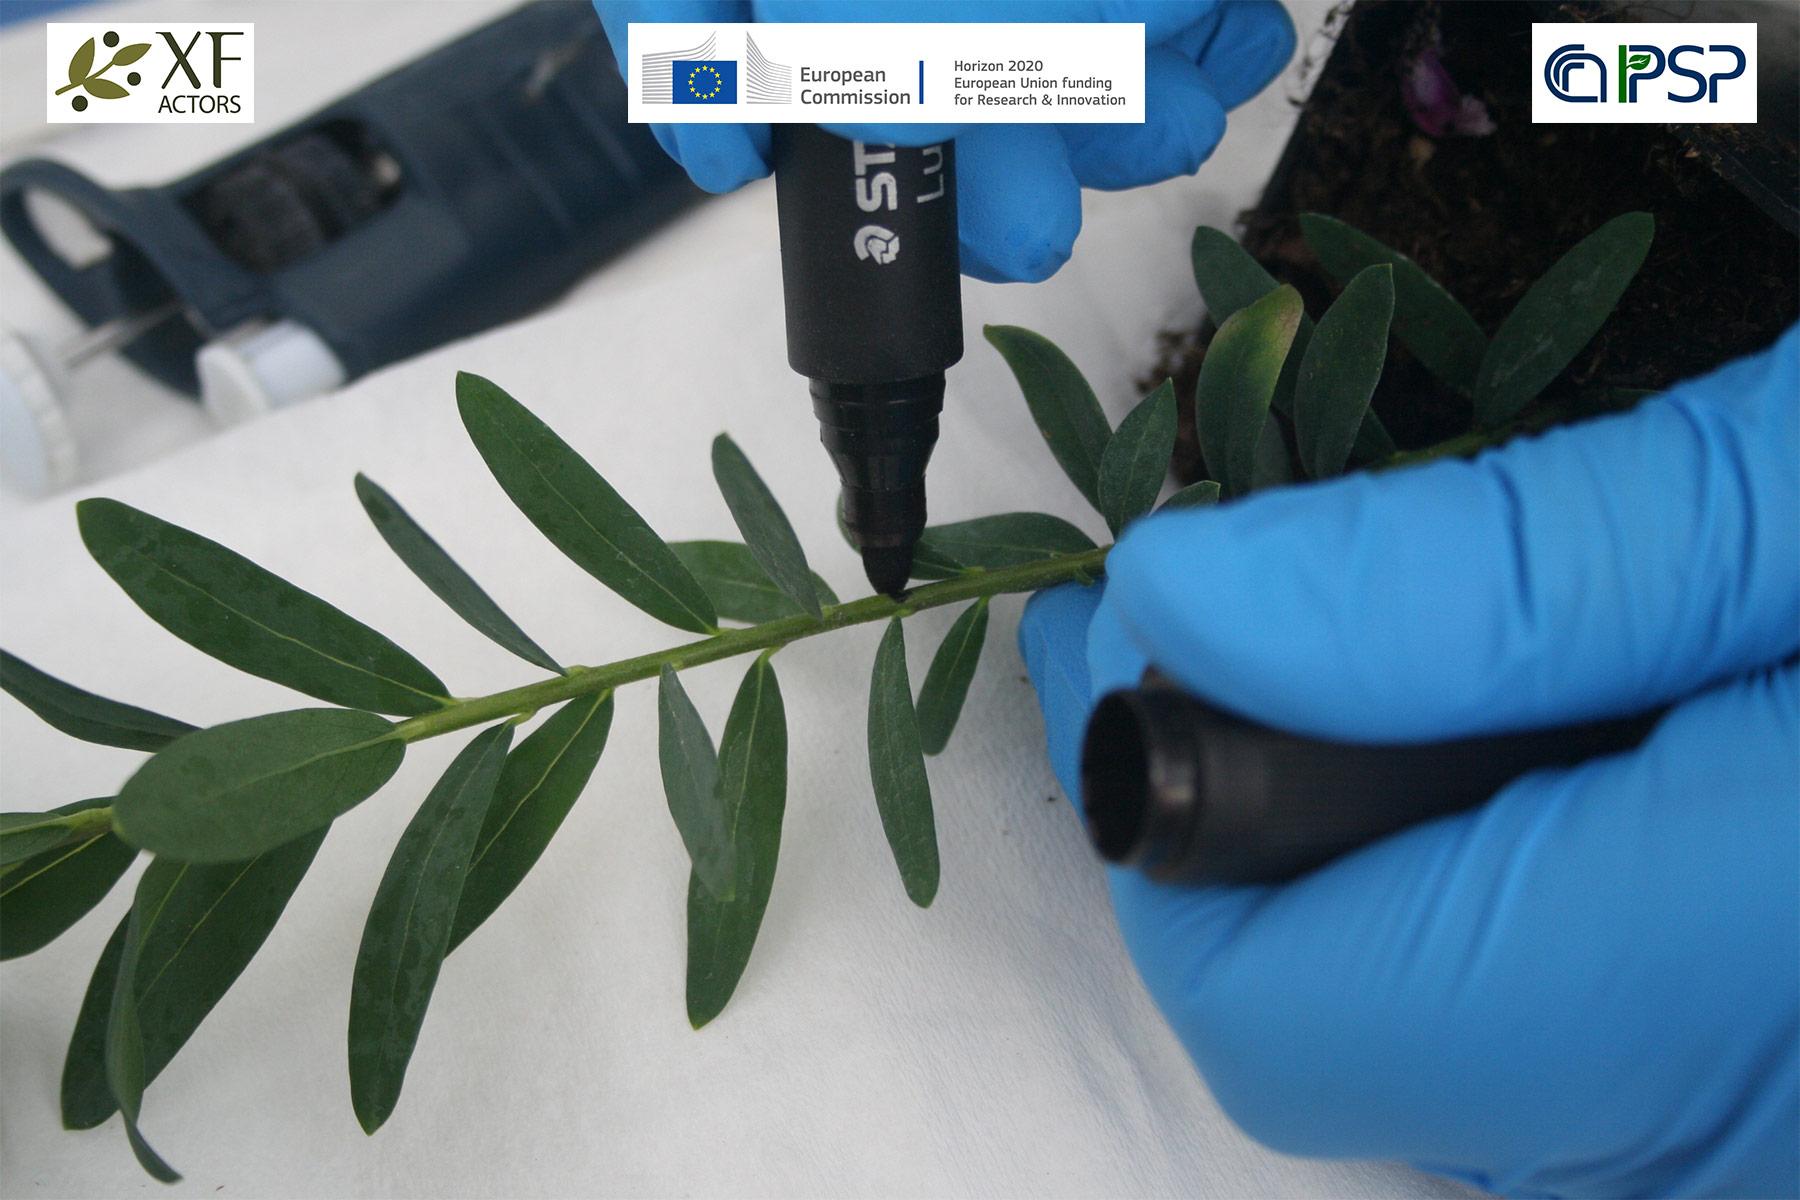 10 - inoculation Xf in Polygala myrtifolia